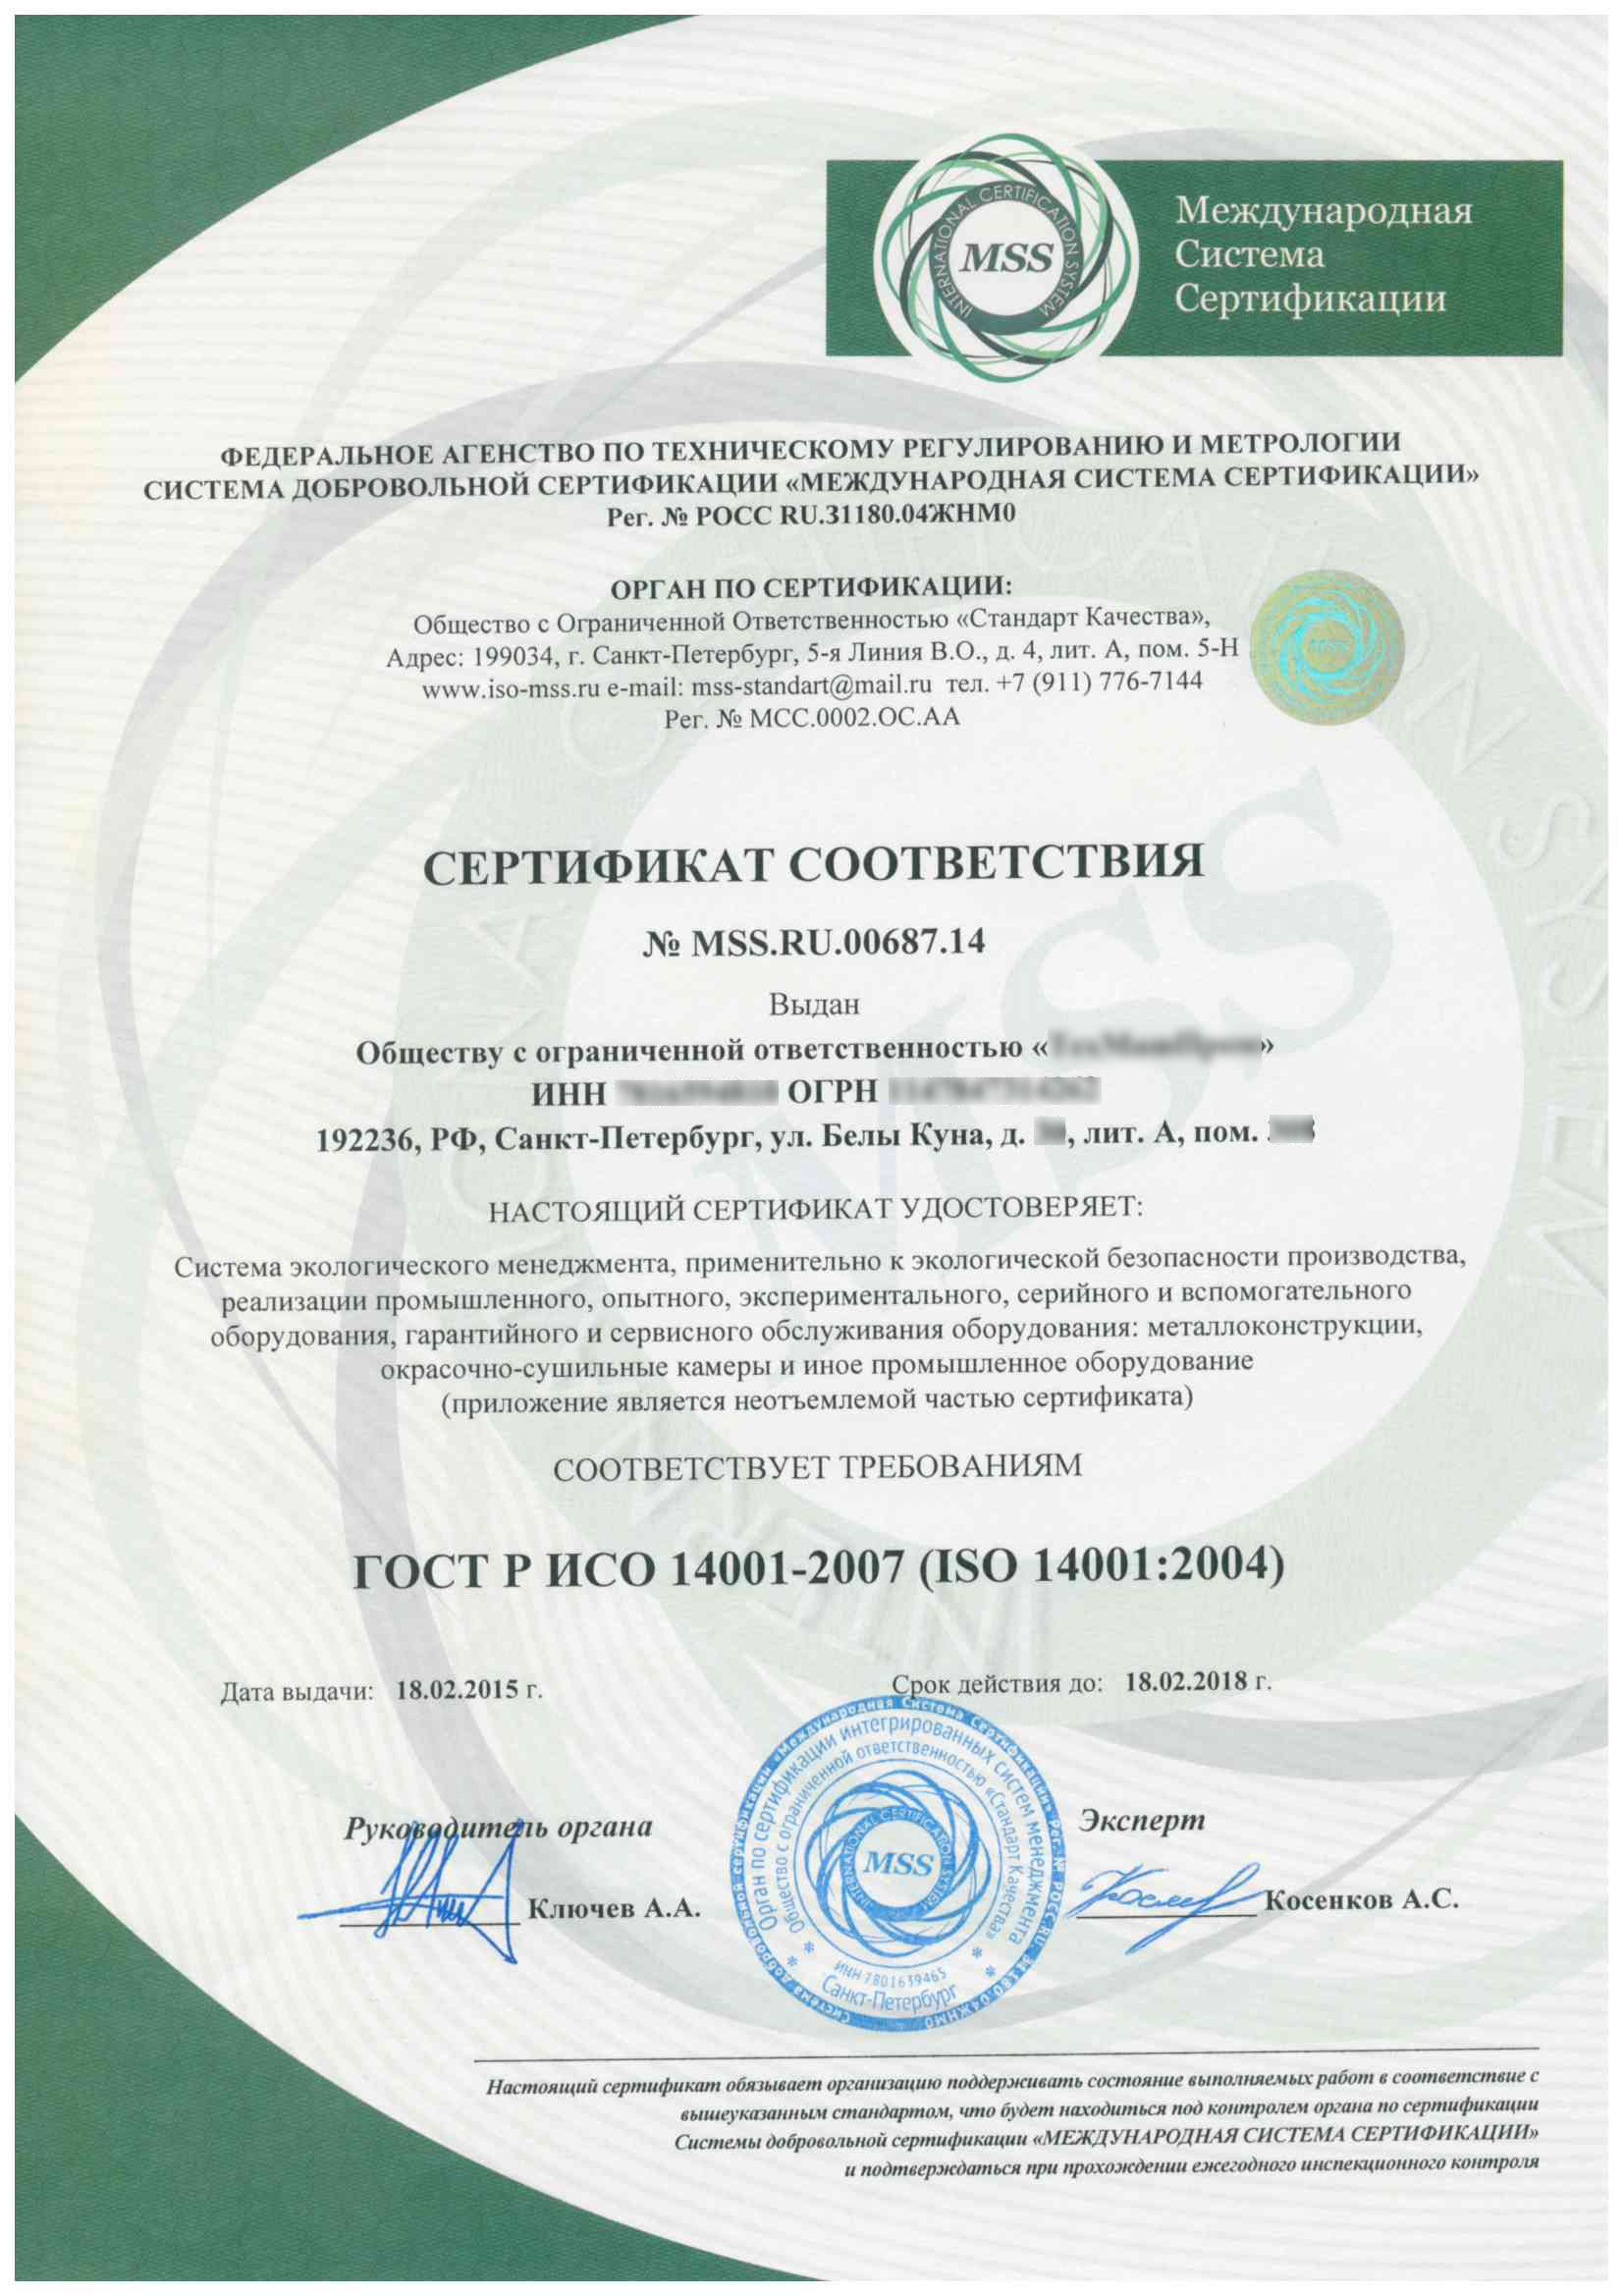 Стандарт iso 14001 гост р исо 14001 списки на получение сертификата в селемджинском районе